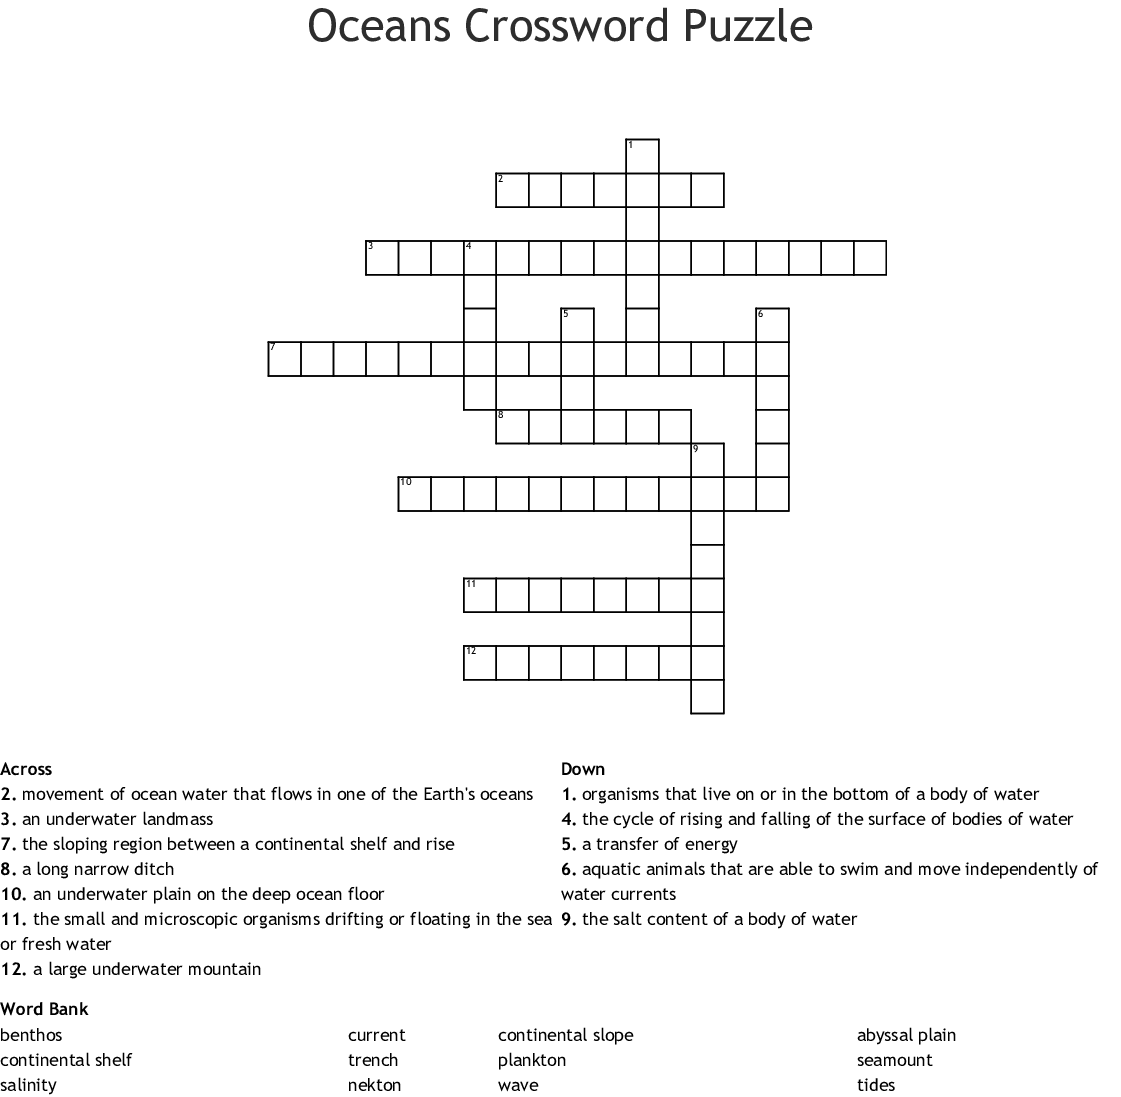 Oceans Crossword Puzzle